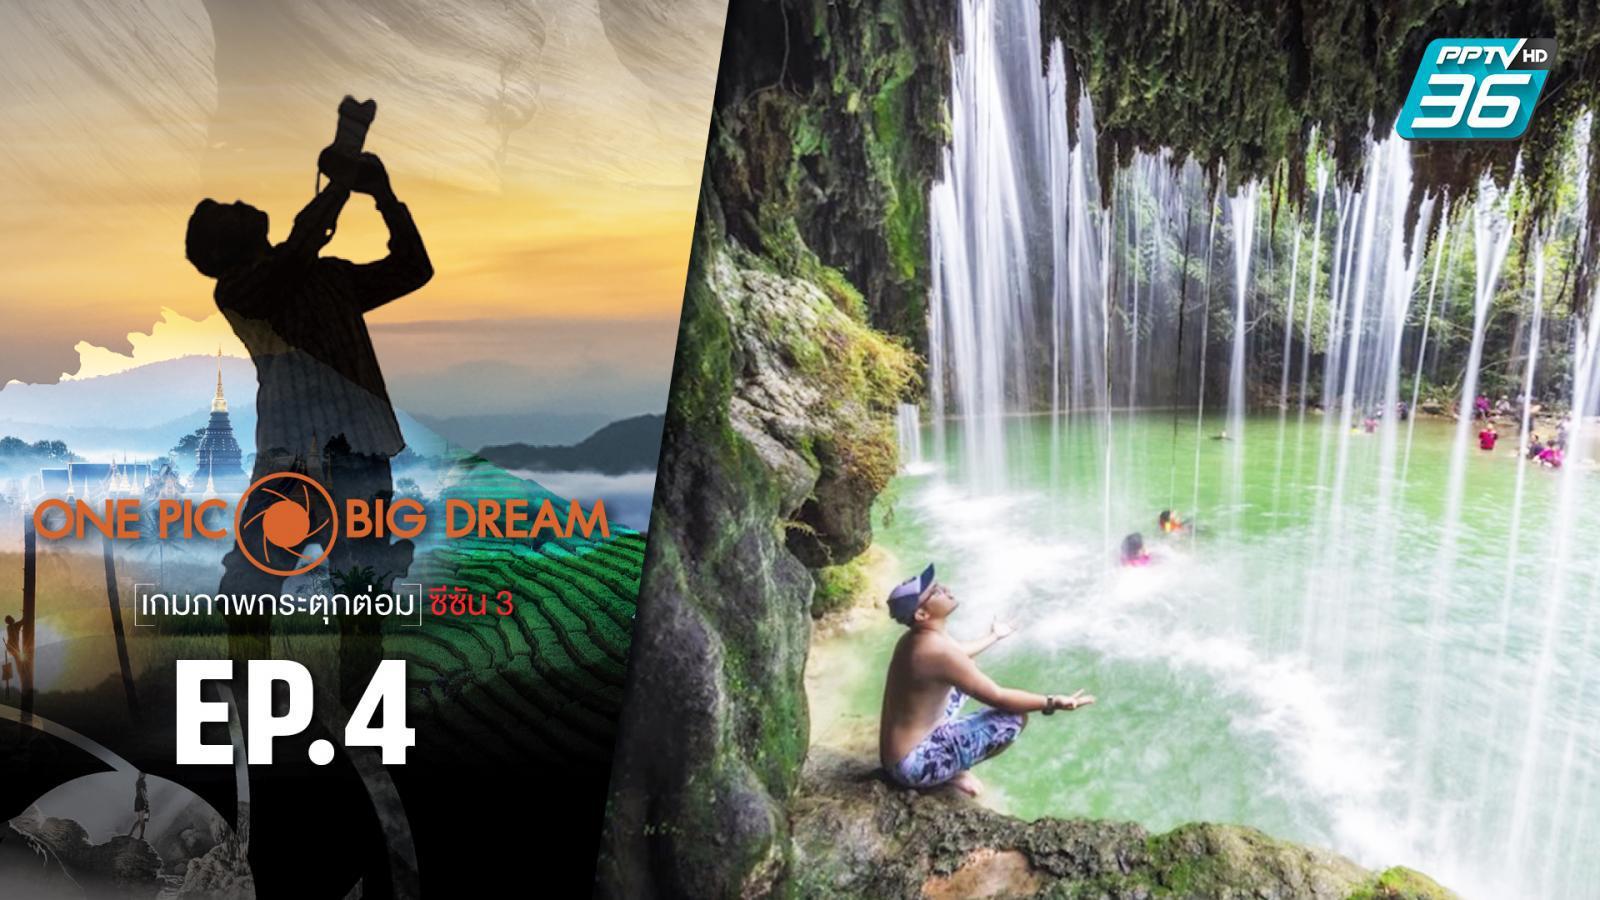 ONE PIC BIG DREAM เกมภาพกระตุกต่อม EP.4 ซีซัน 3 | 20 ม.ค. 64 | PPTV HD 36